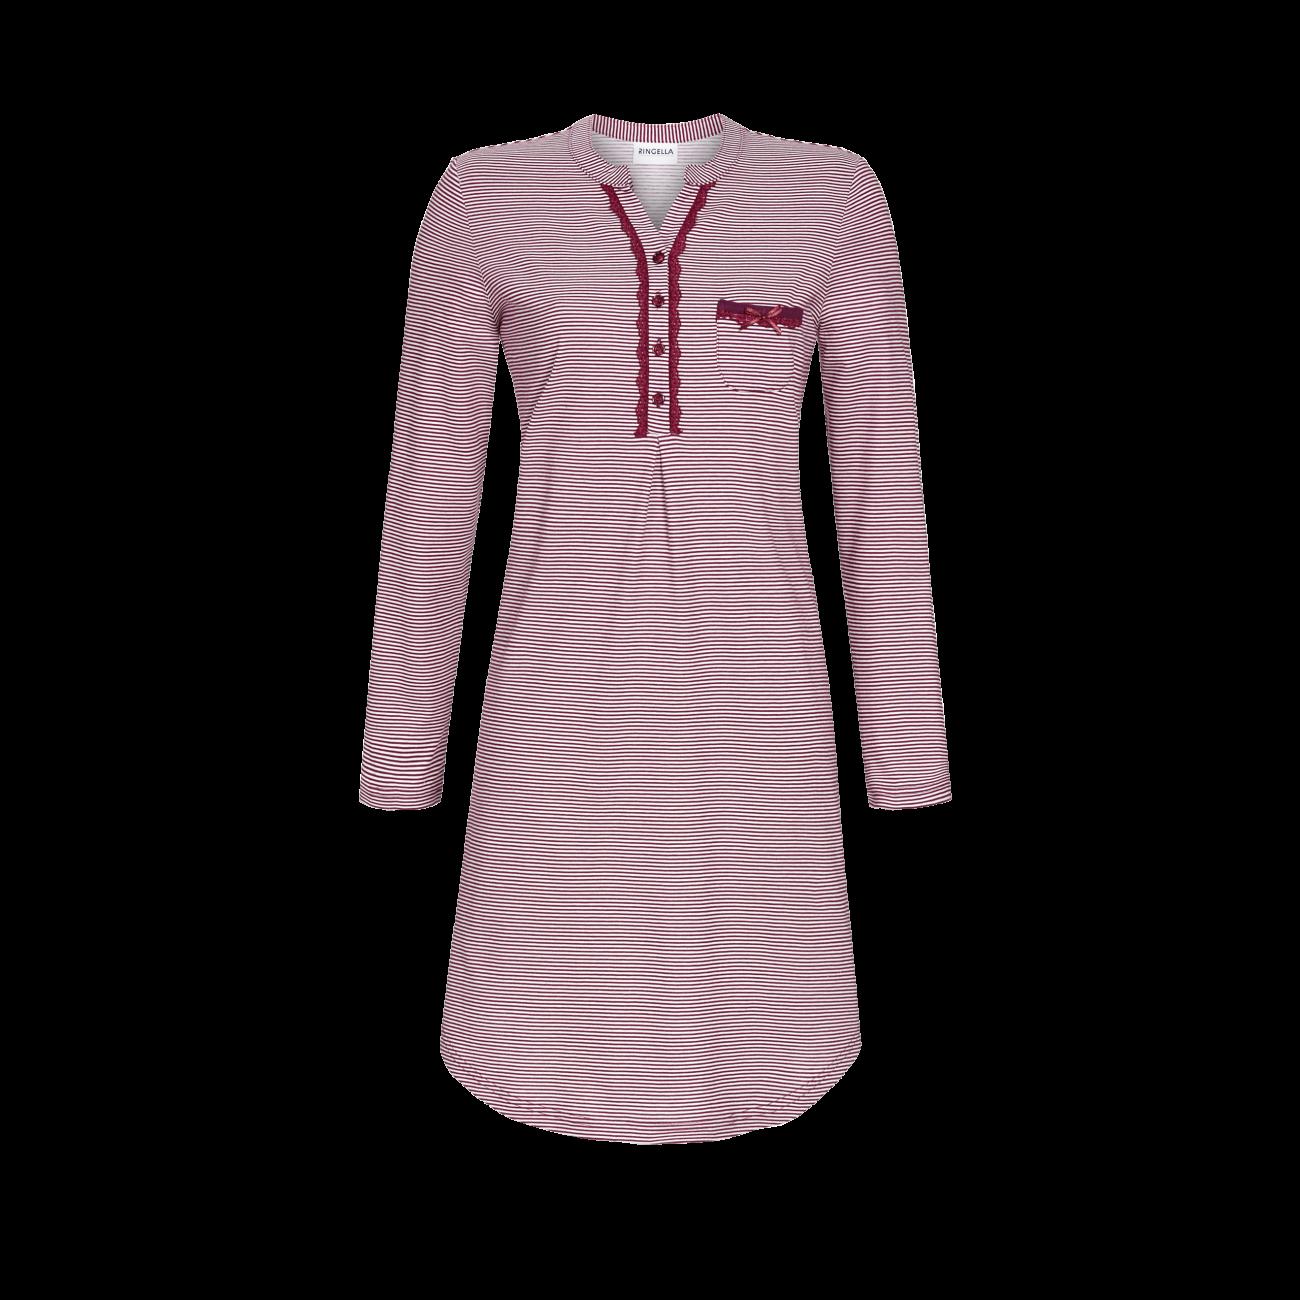 Nachthemd mit Knopfleiste bordeaux | 38